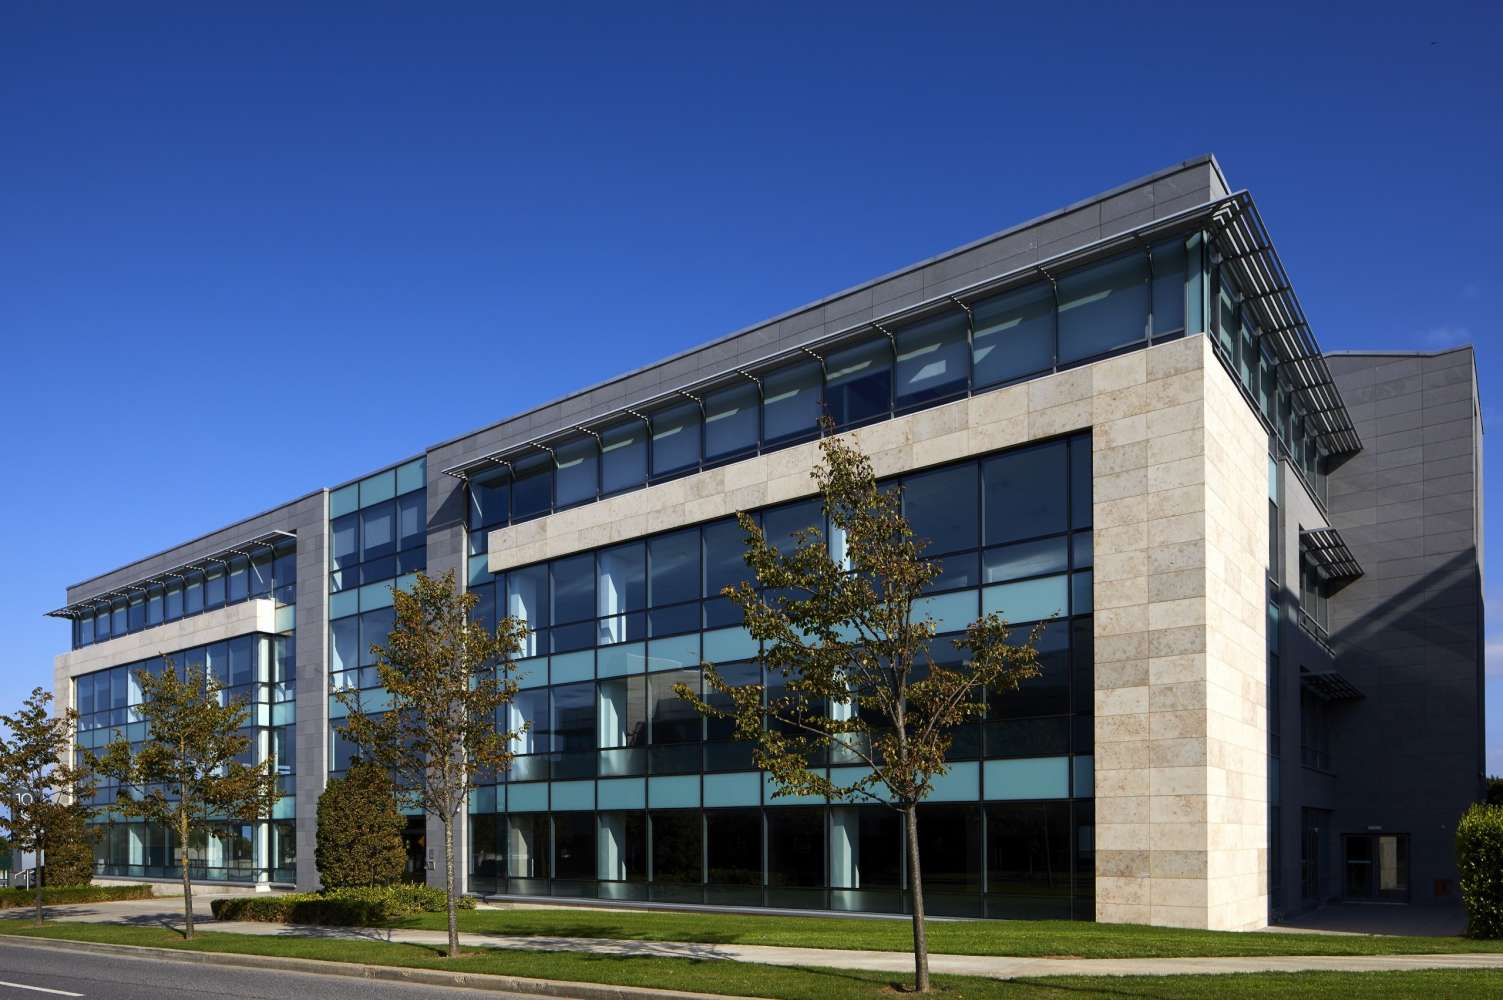 Office Co dublin, D18 K7W4 - Building 10, The Campus, Cherrywood - 10526053